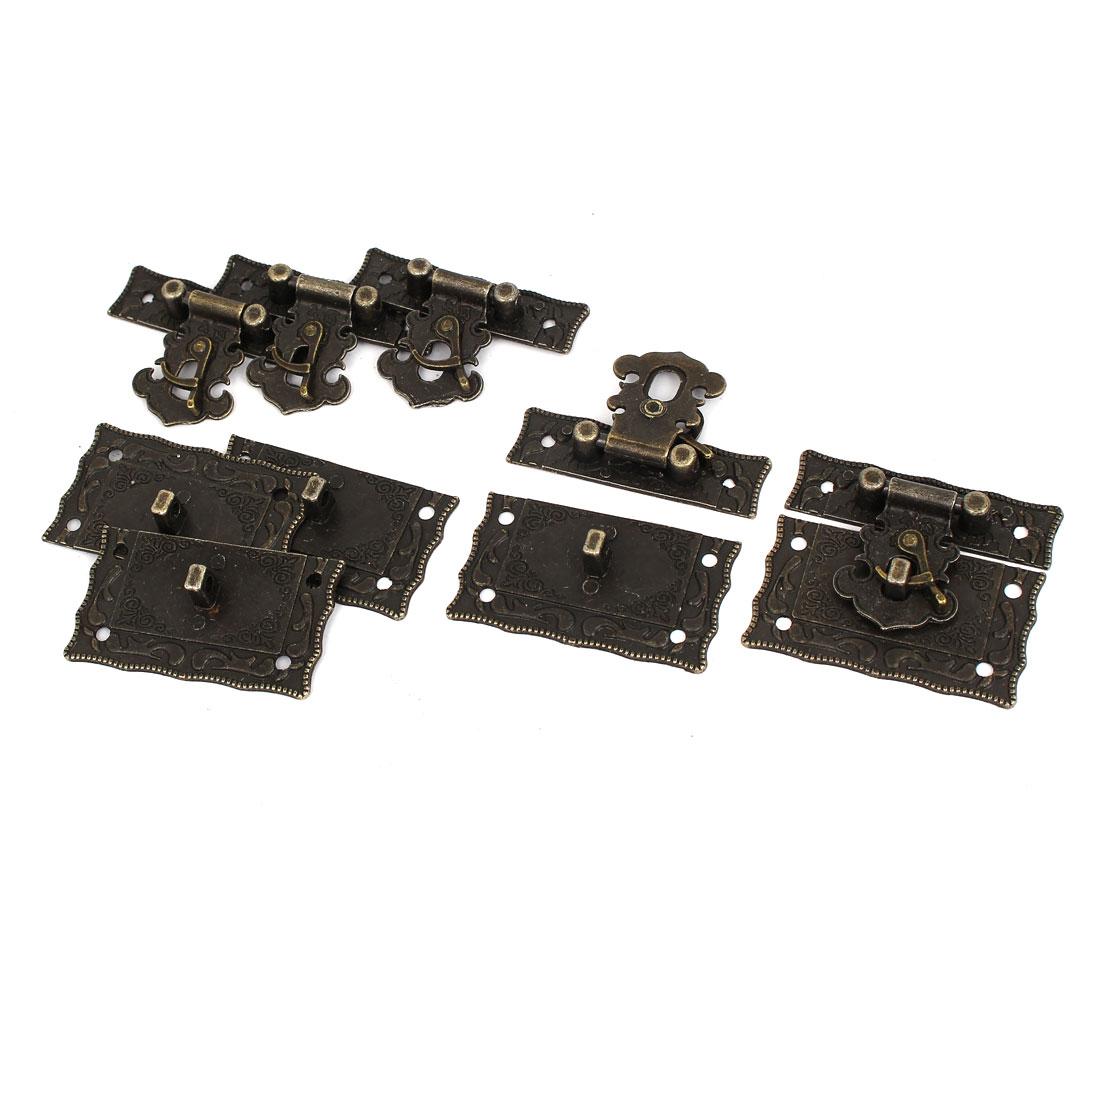 Antique Style Wooden Case Chest Box Clasp Hasp Latch Bronze Tone 5 Sets